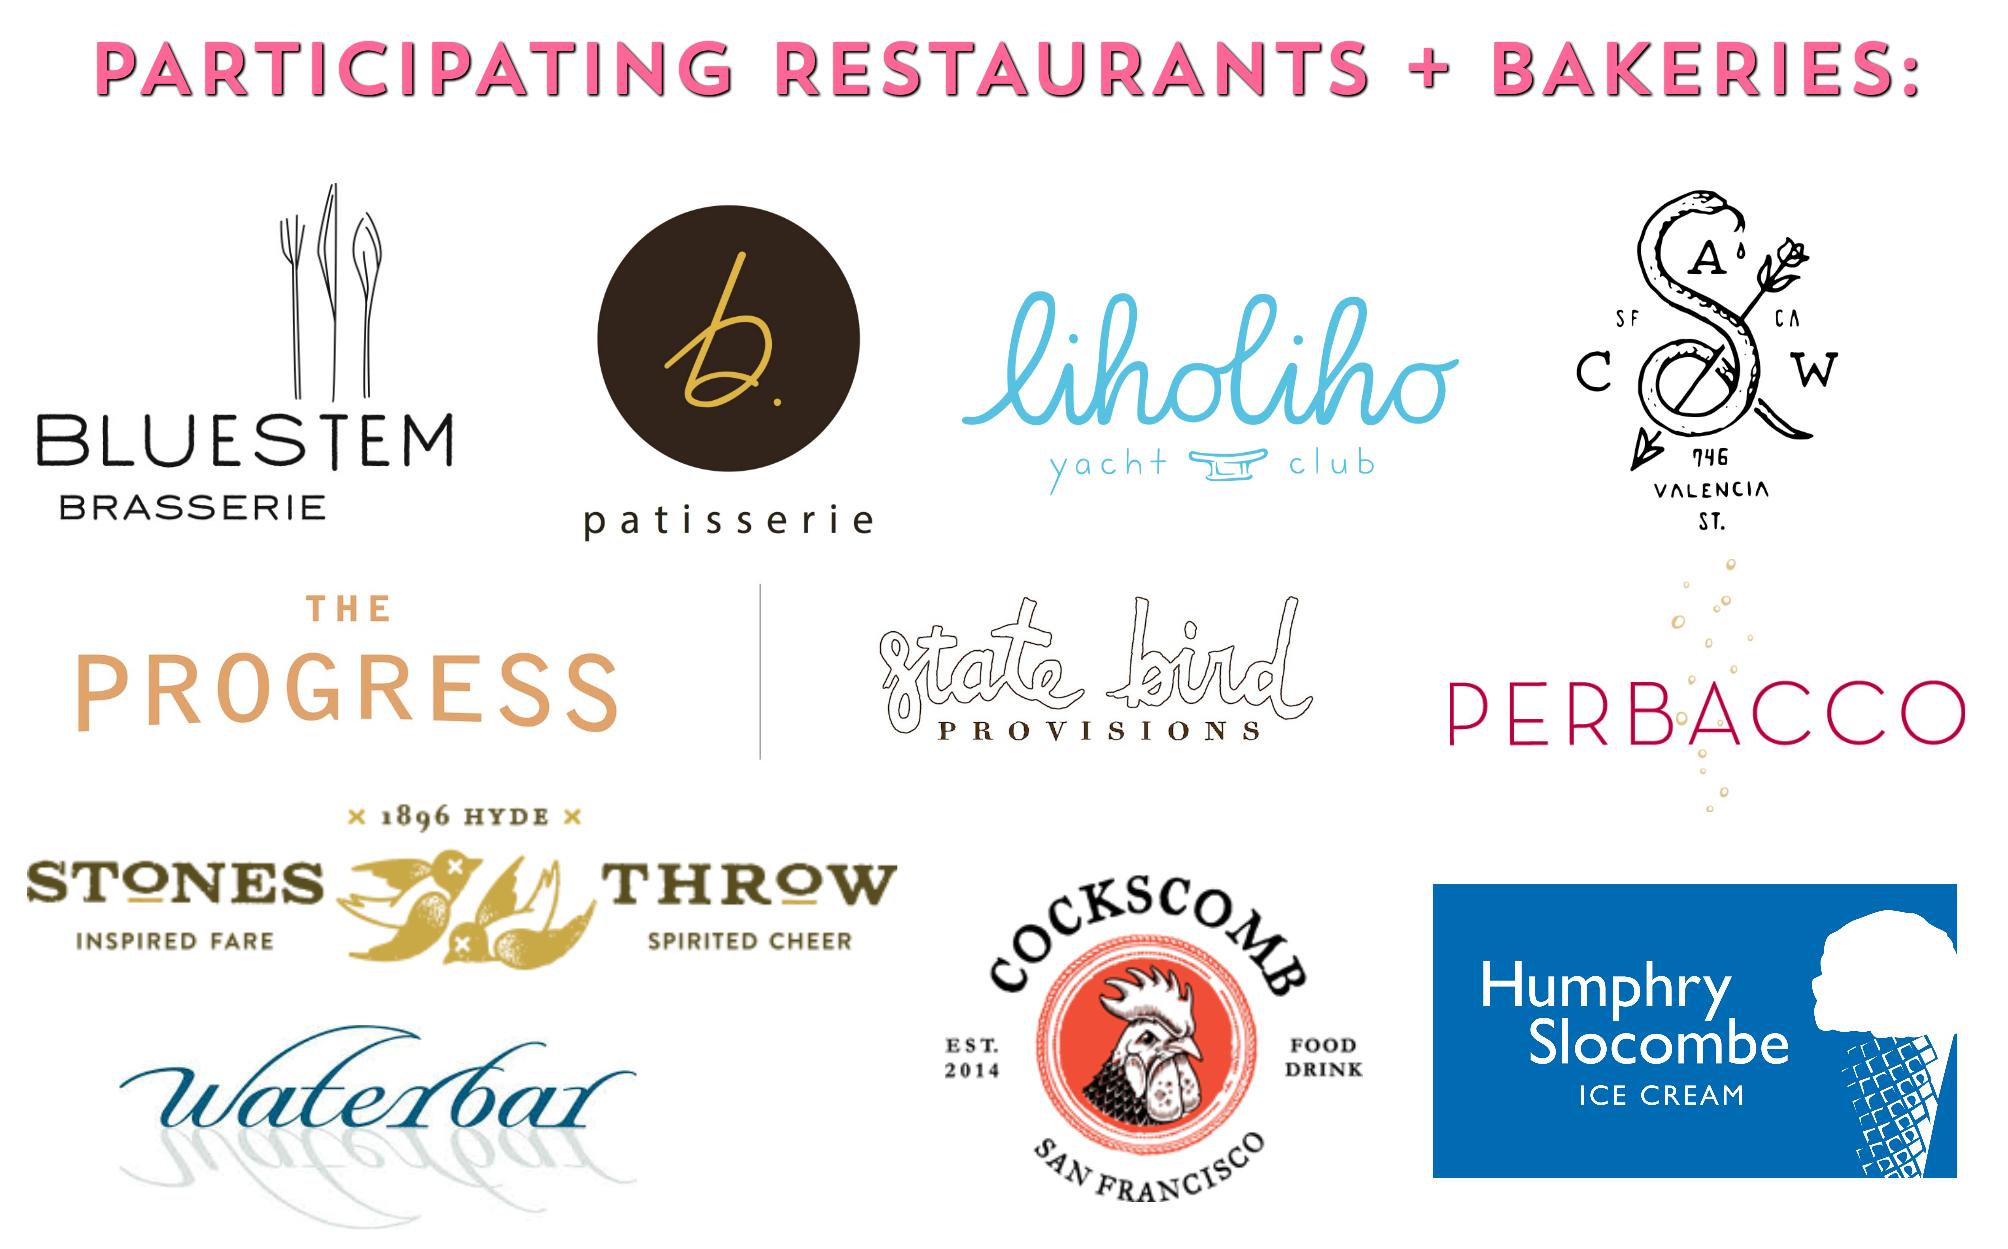 Participating restaurants + bakeries: